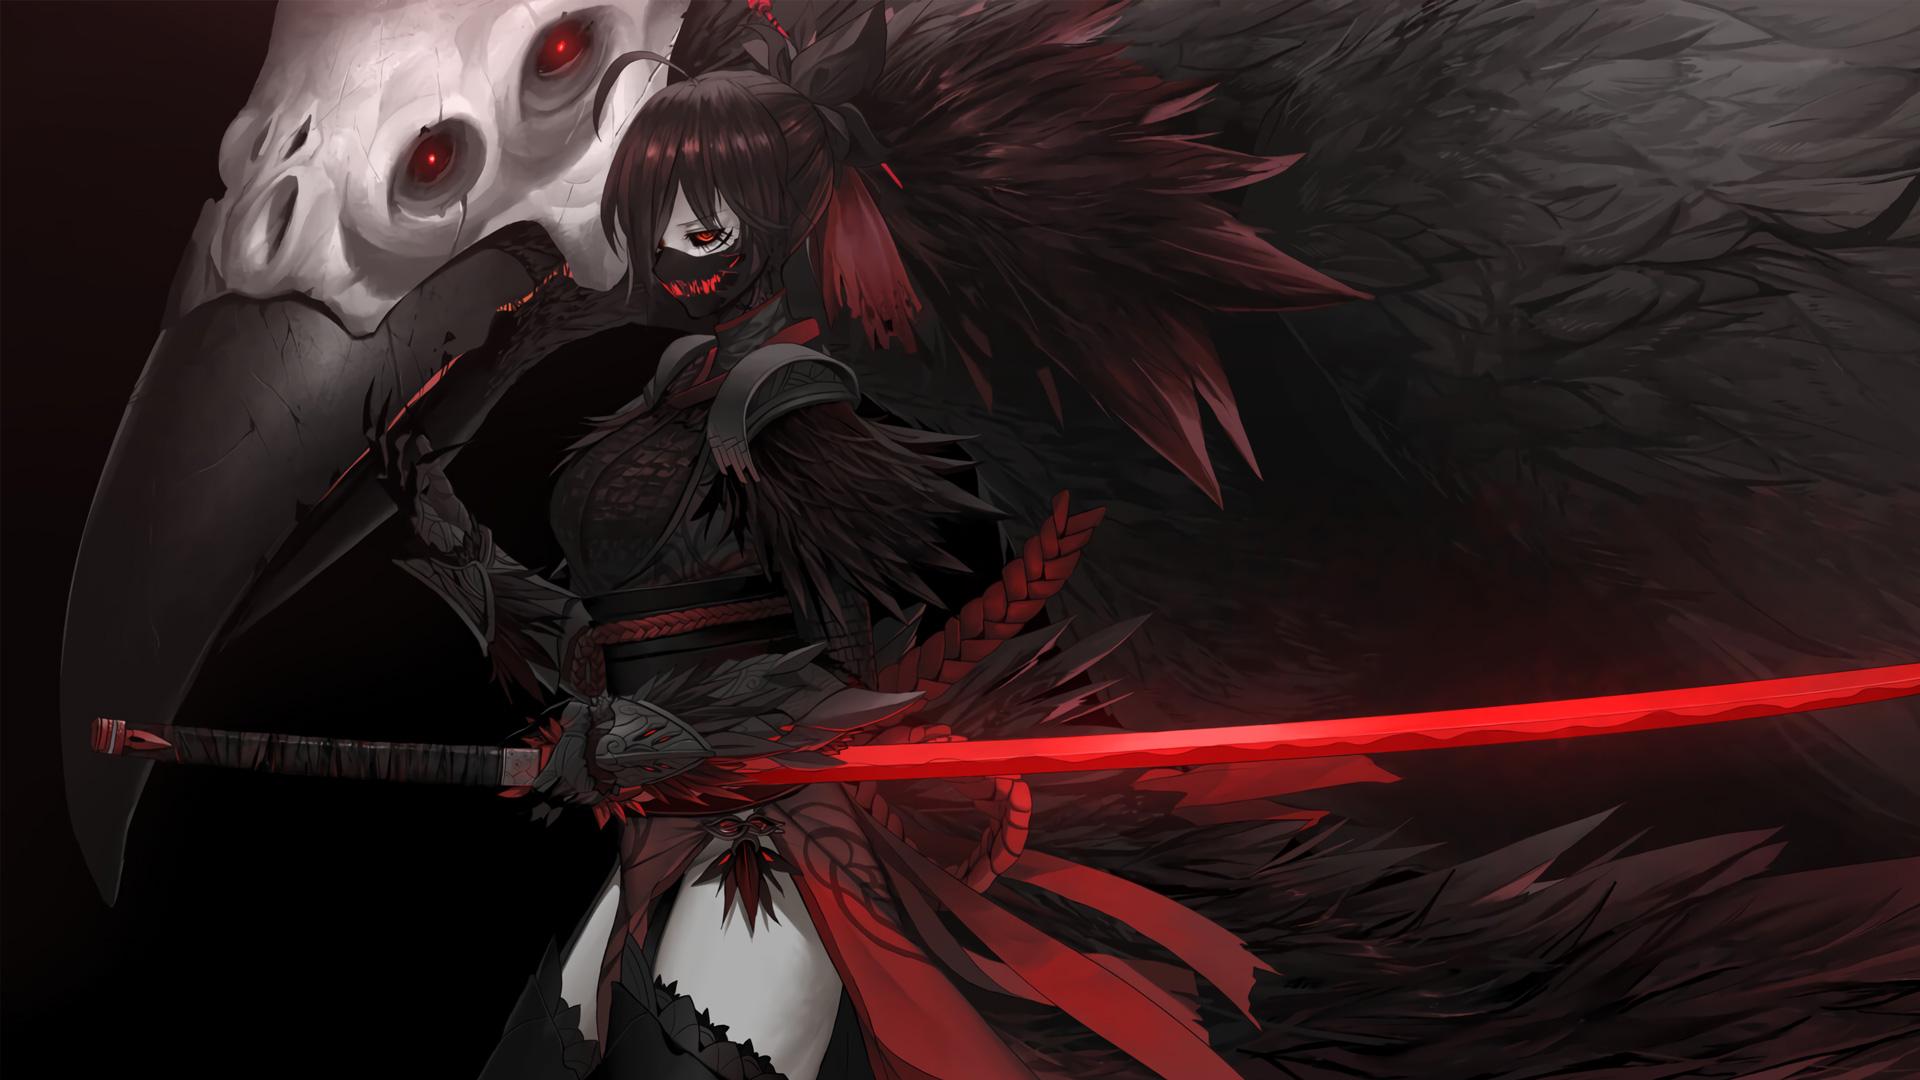 Anime Girls Dark Katana Skull Creepy Raven Dishwasher1910 RWBY Grimm RWBY Raven Branwen Nevermore RW 1920x1080